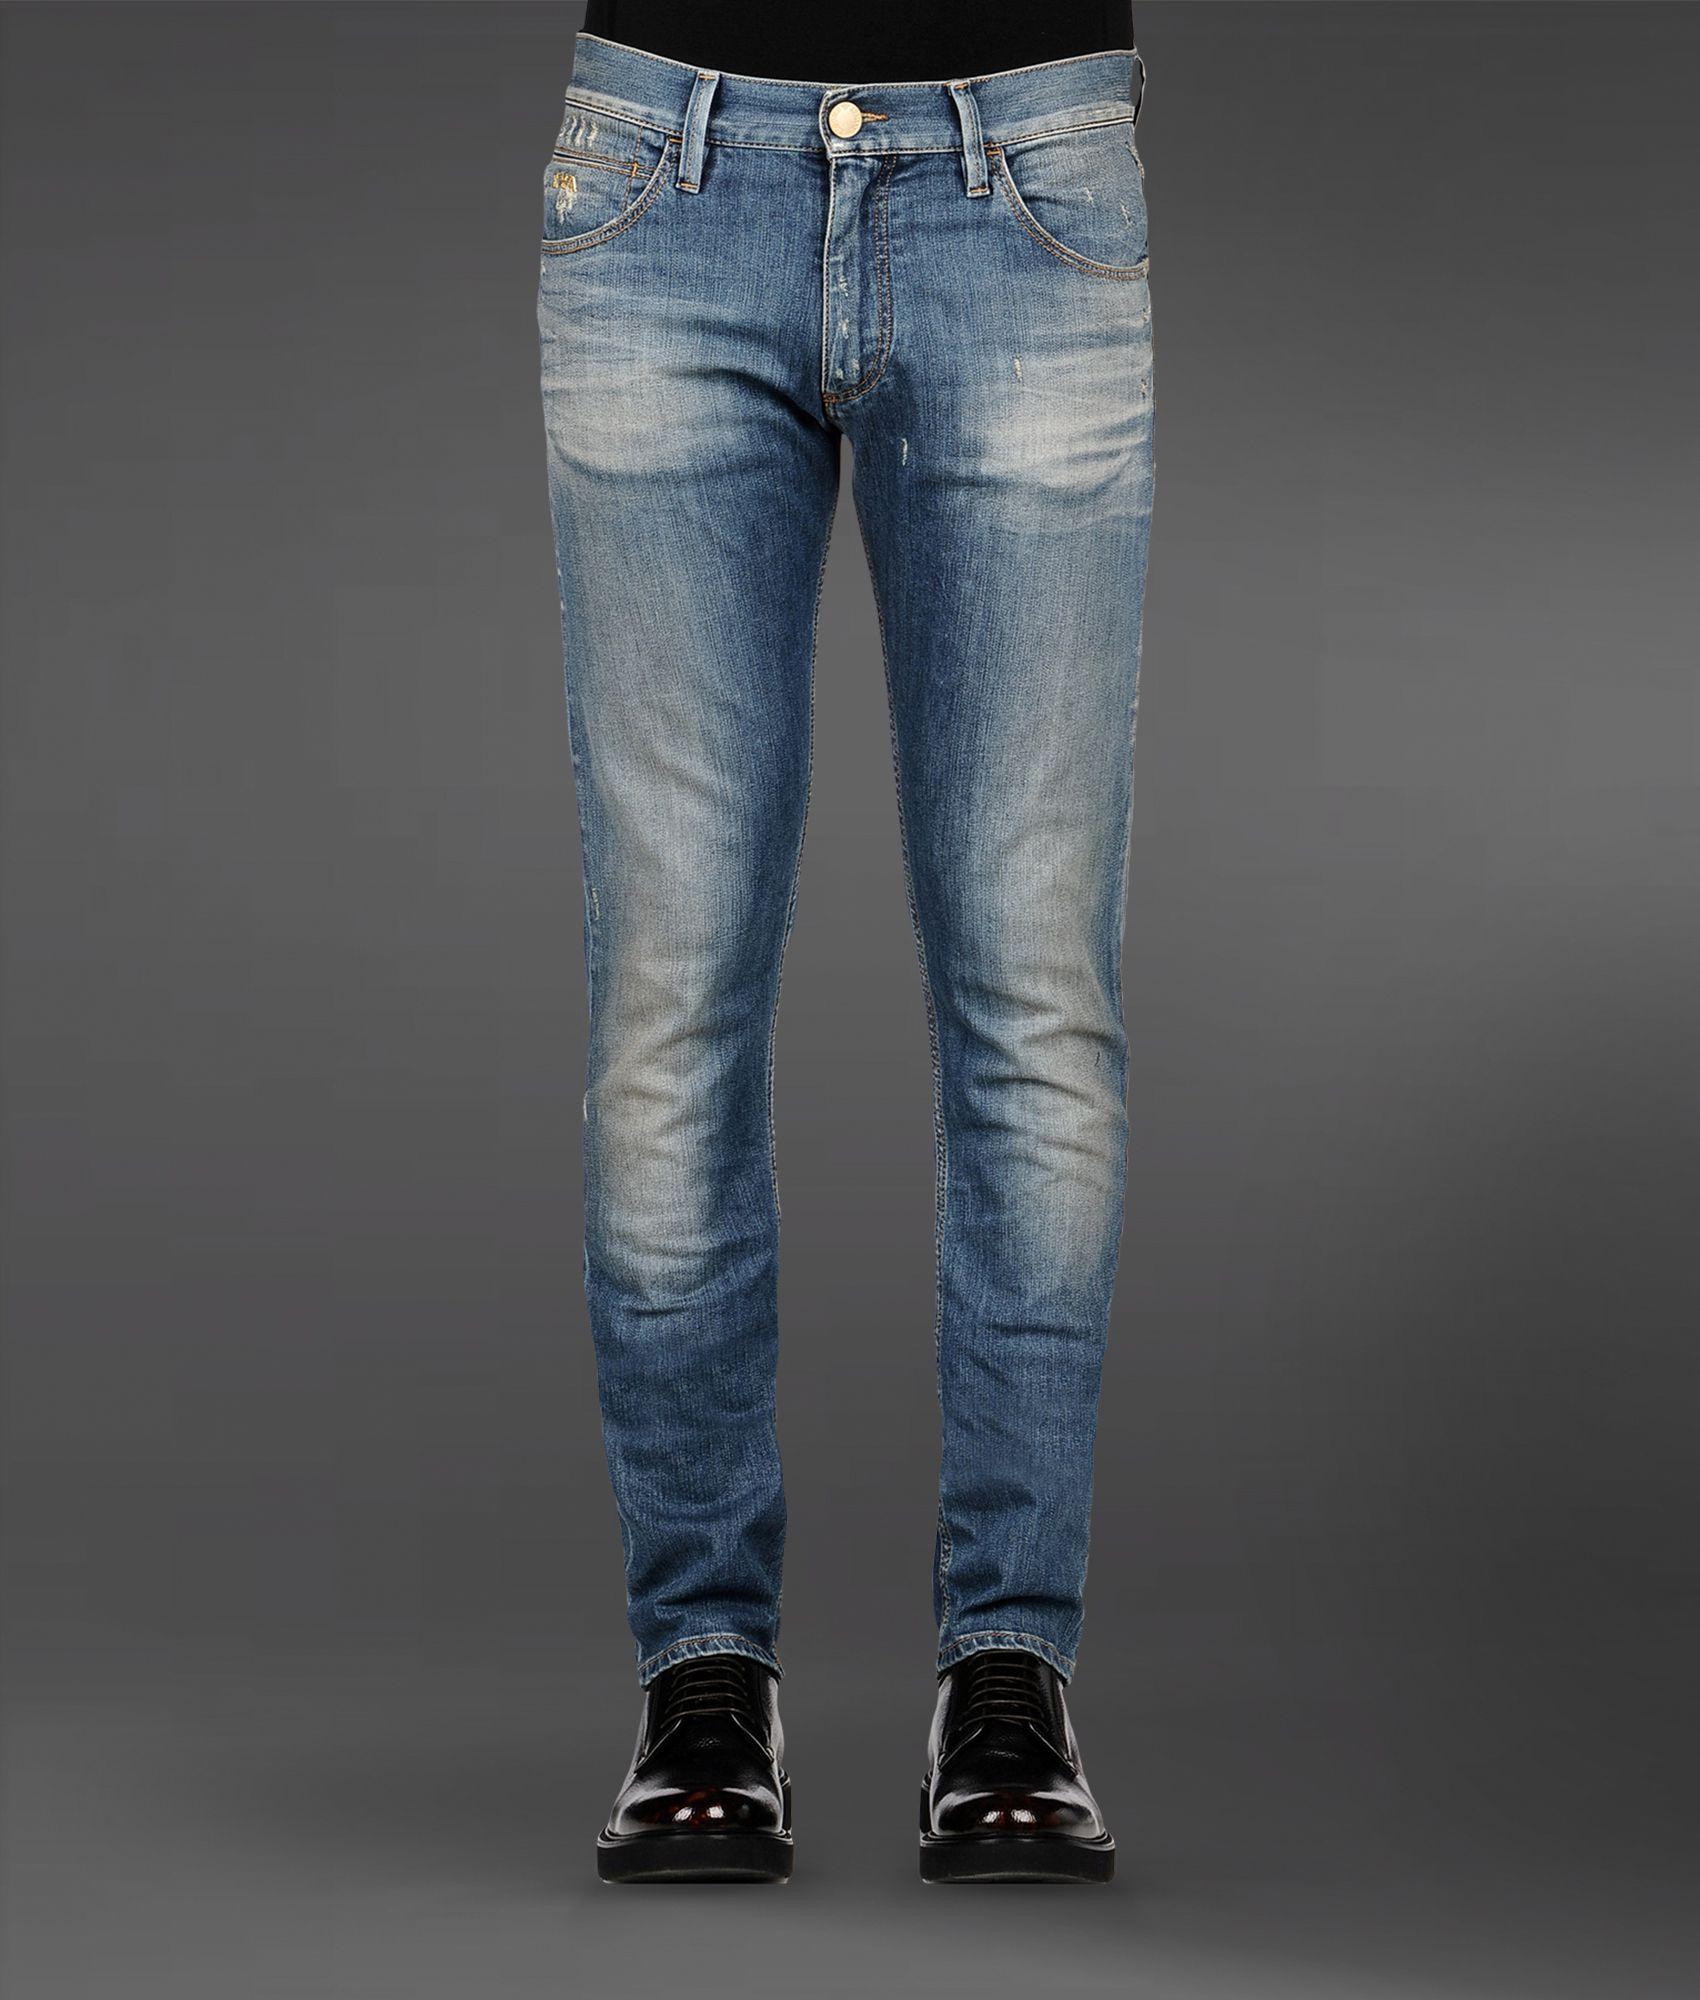 4a260b940e Emporio Armani Blue Regular Fit Medium Wash Jeans for men